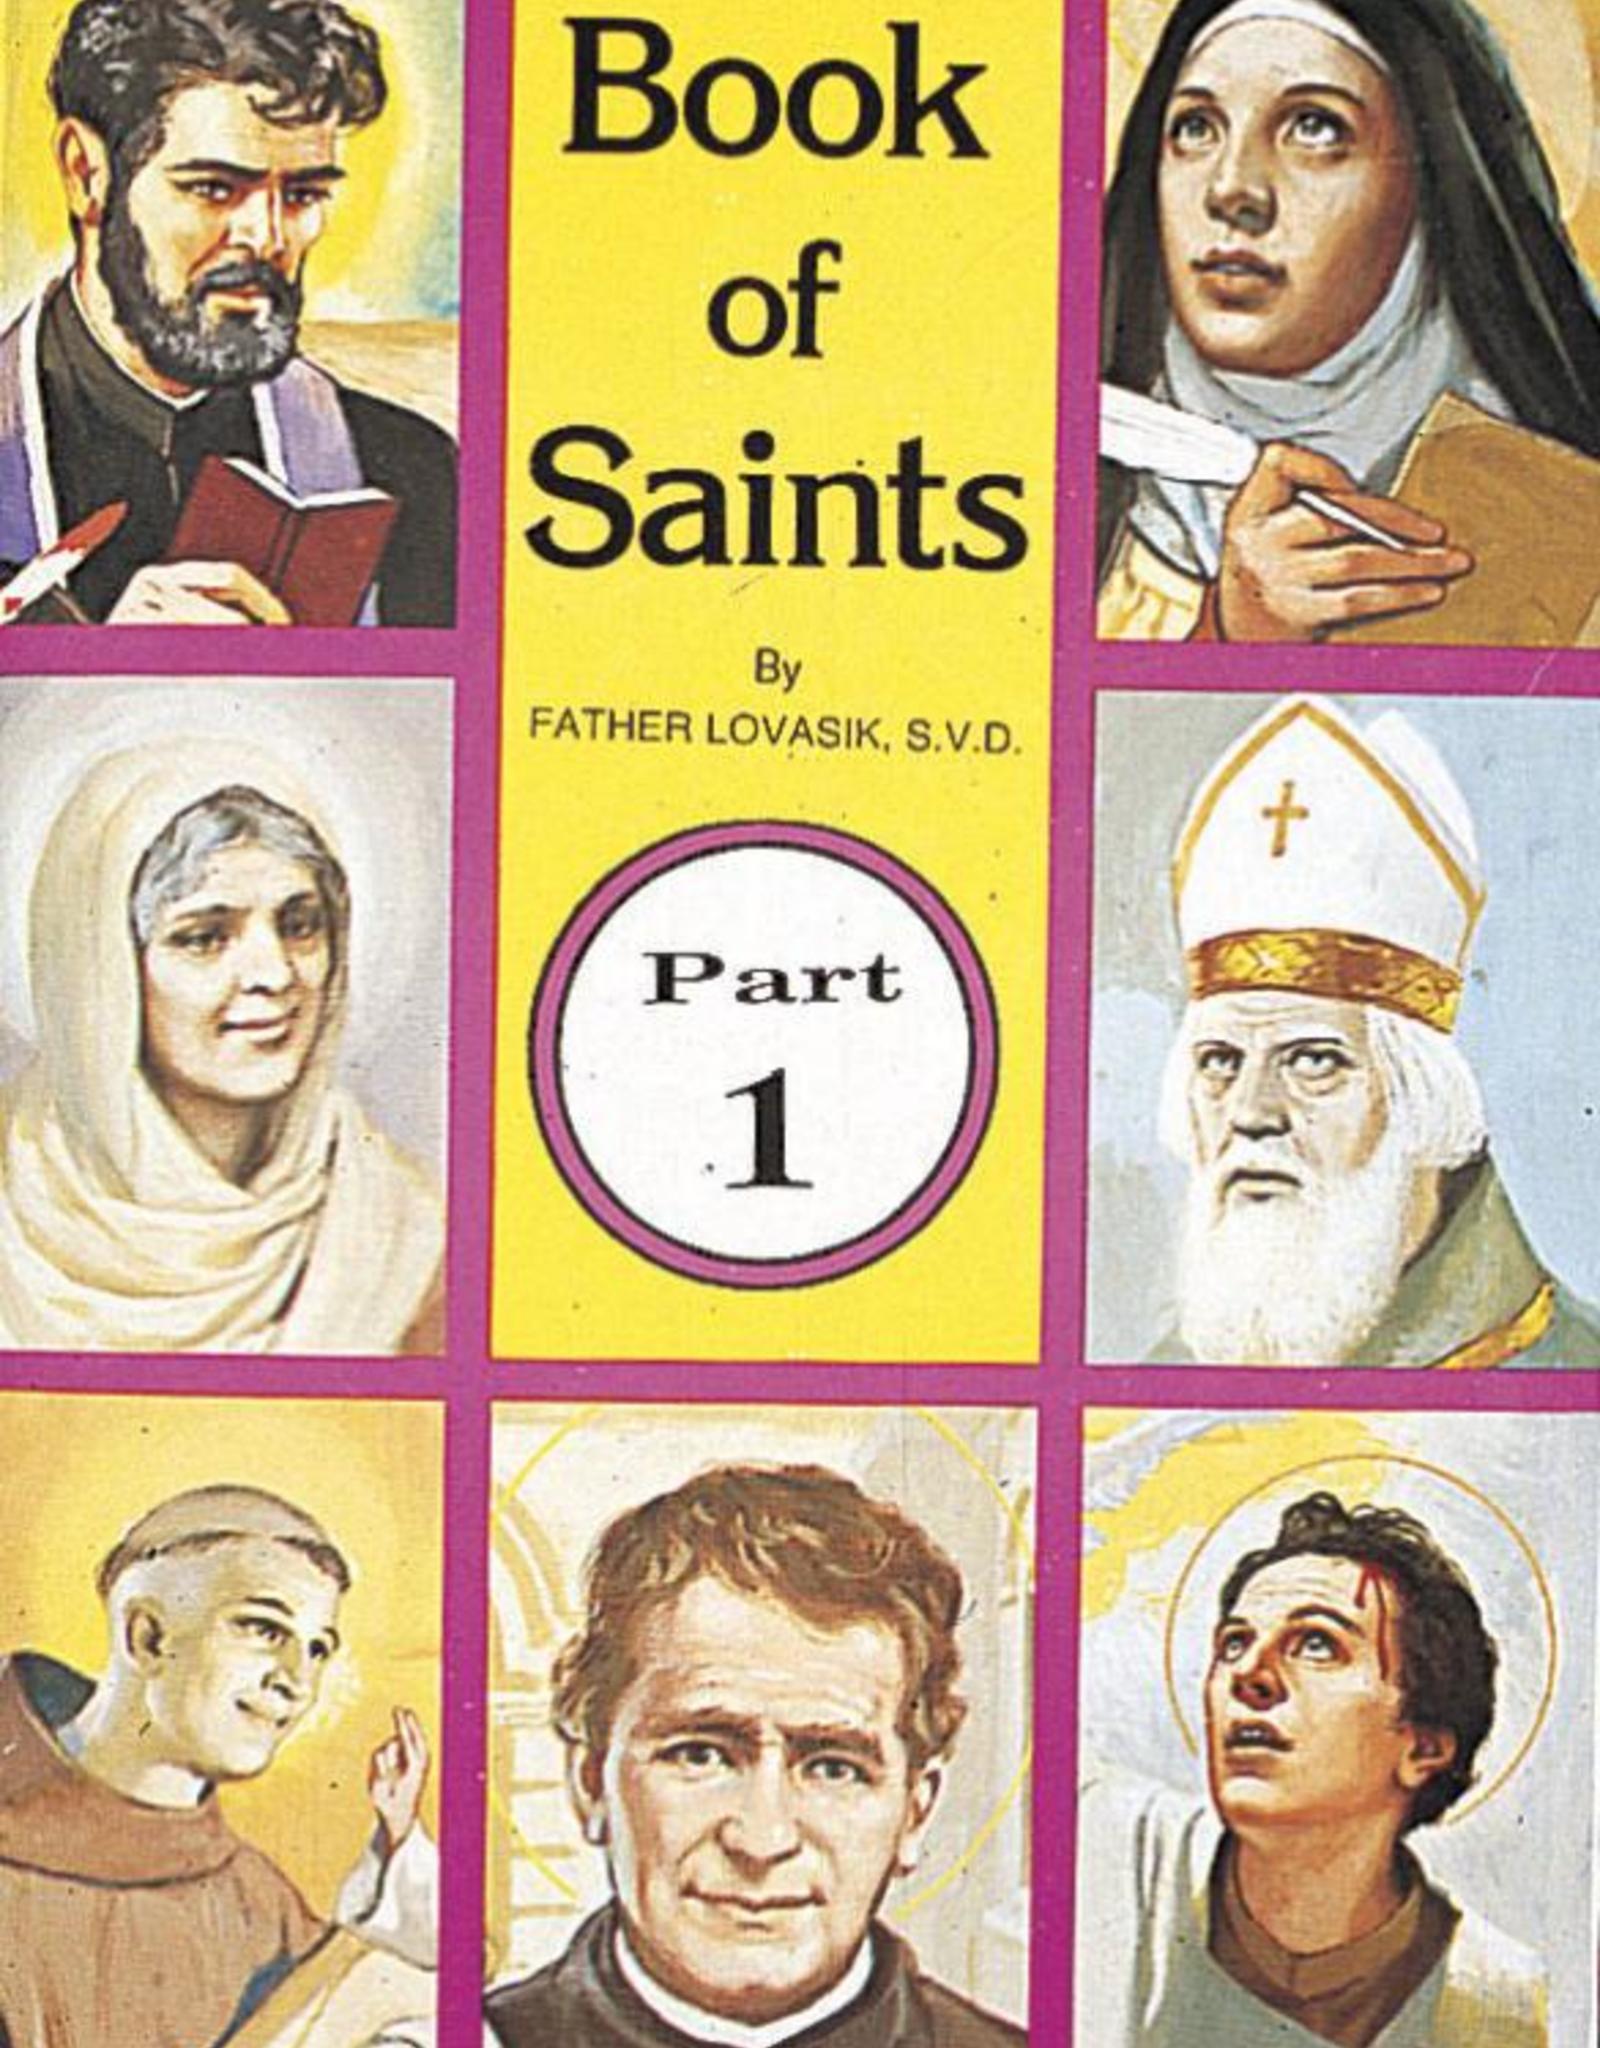 Catholic Book Publishing Book of Saints (Part 1), by Rev. Lawrence Lovasik